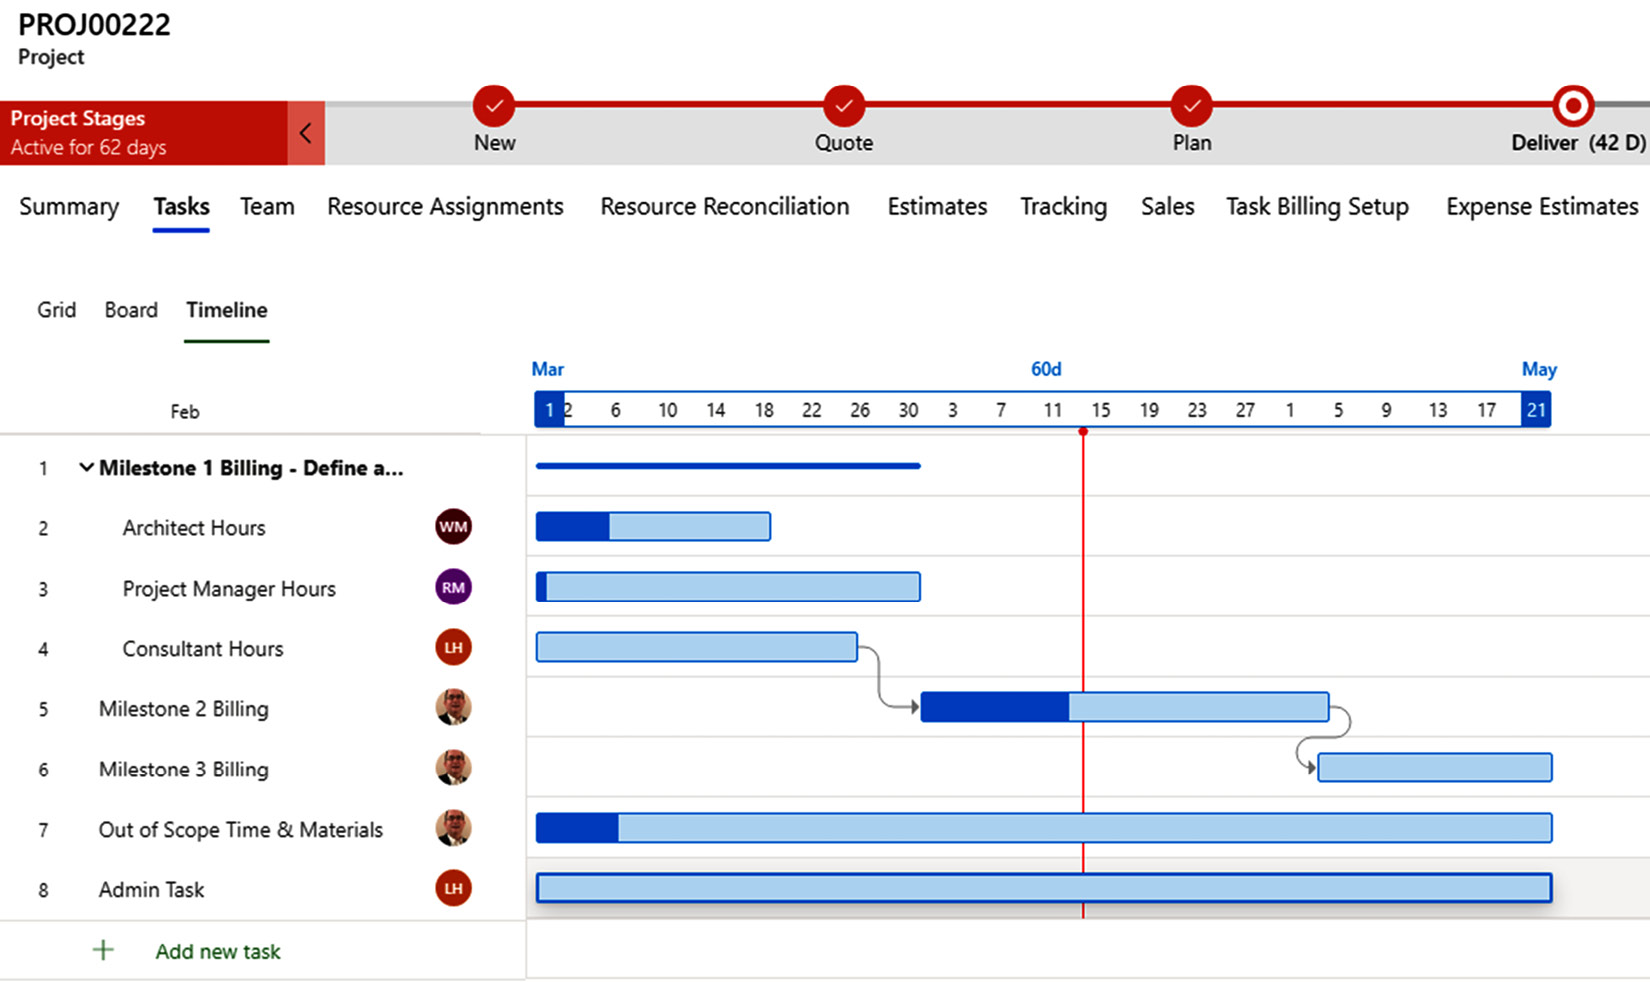 Figure 1.3 – Microsoft Dynamics 365 Project Operations